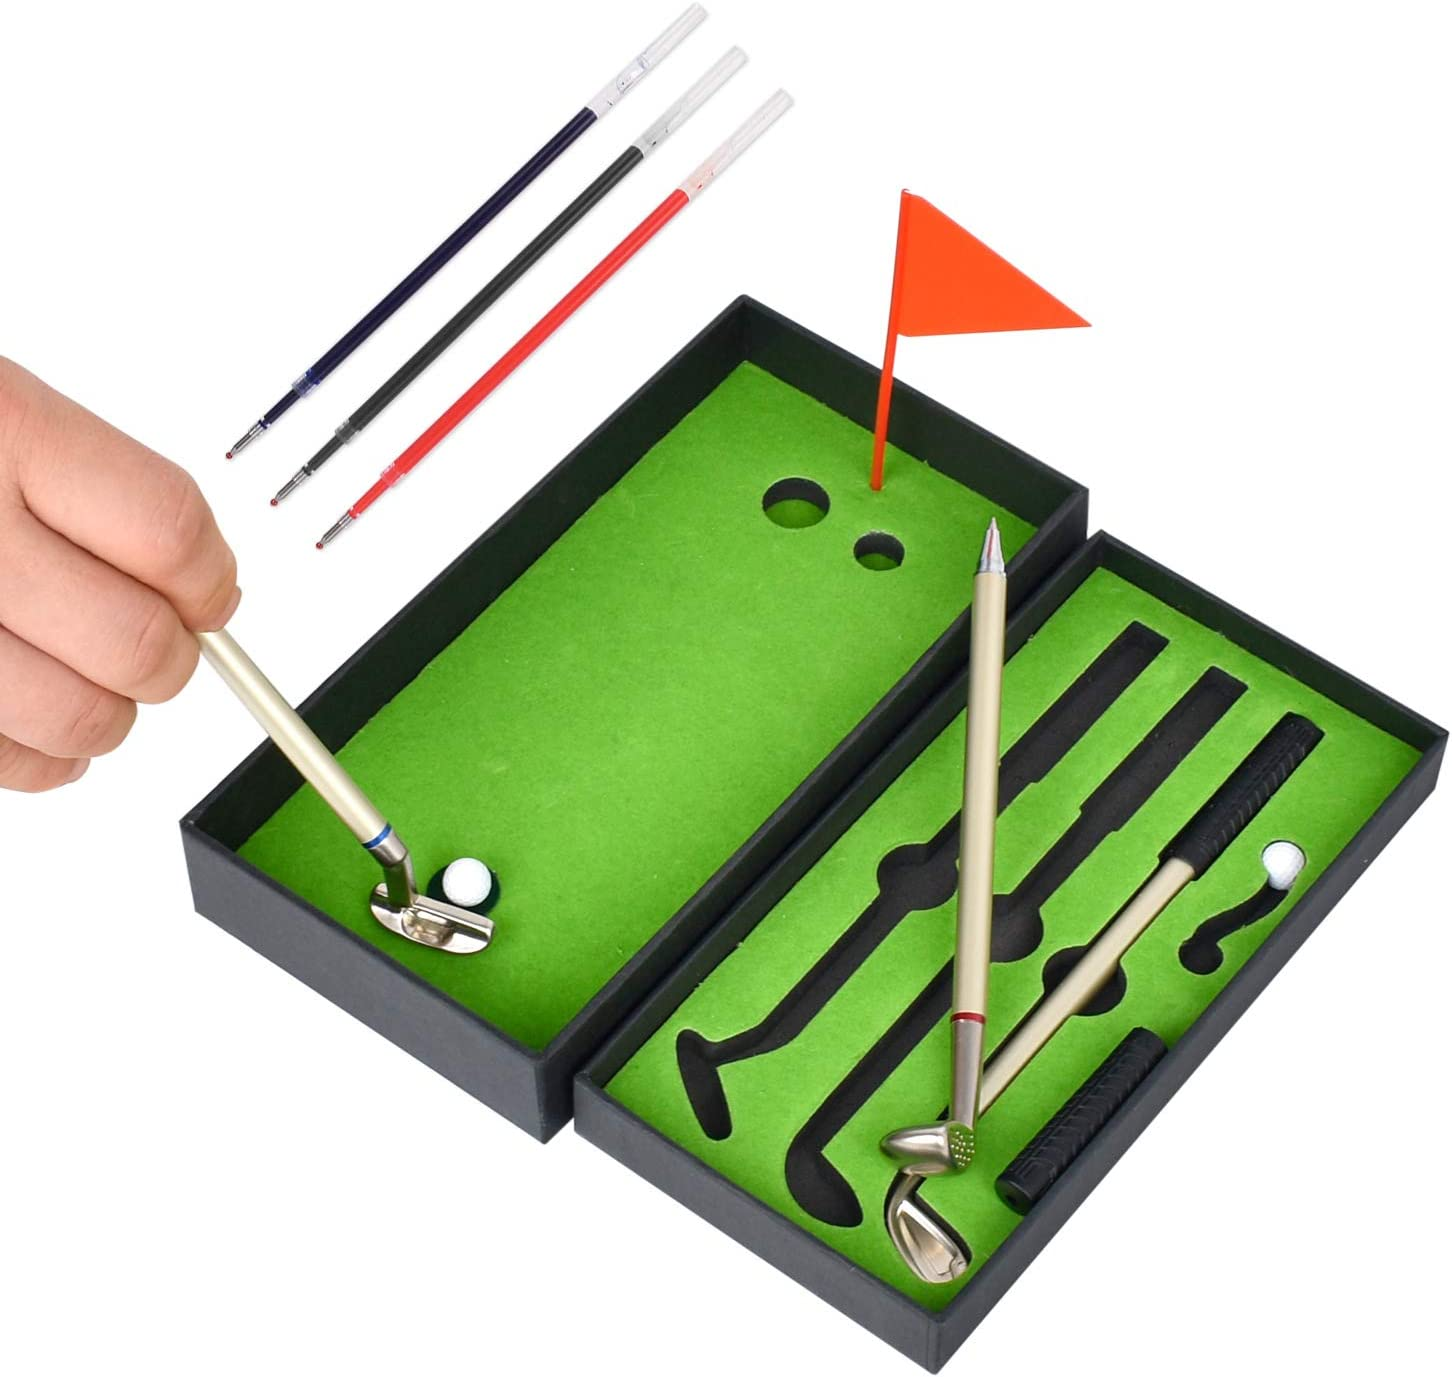 Mini Man Golf Game-Mini Golf Pen Set-Desktop Golf Pen Toy Set- Mini Desk Games-Funny Gifts for Adults Men Dad Husband - Unique Novelty Cute Cool Office Tabletop Sports Decor Accessories